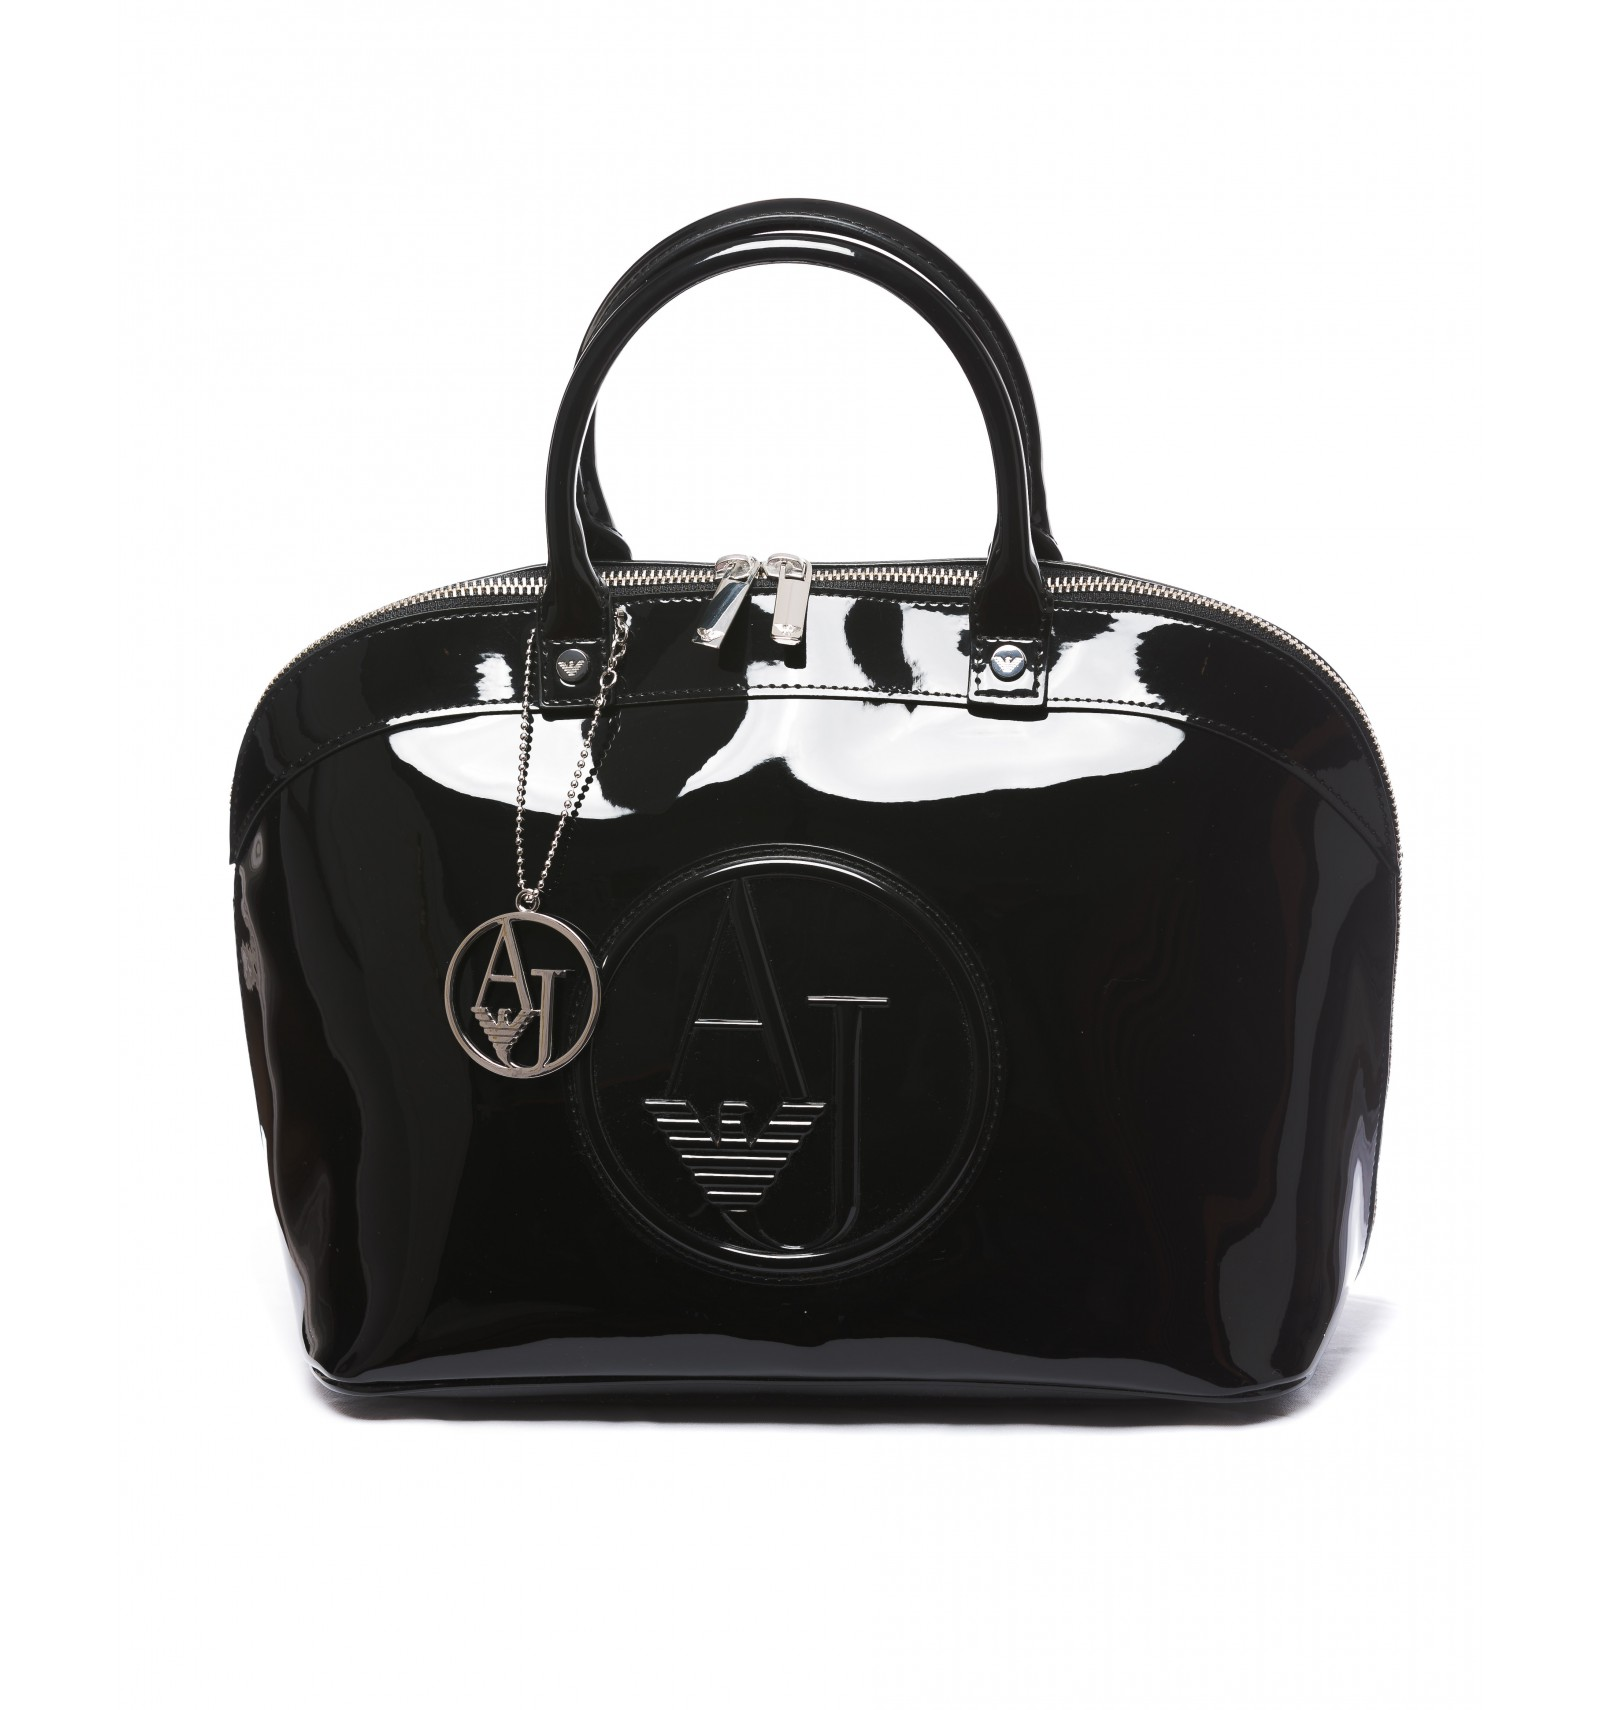 Sac femme noir brillant. SAC A MAIN ARMANI JEANS FEMME verni BAG taschen RN  103723 ITALY EMPORIO ARMANI Armani jeans Gamoura blanc sacs cabas shopping  ... f3b660cb625d